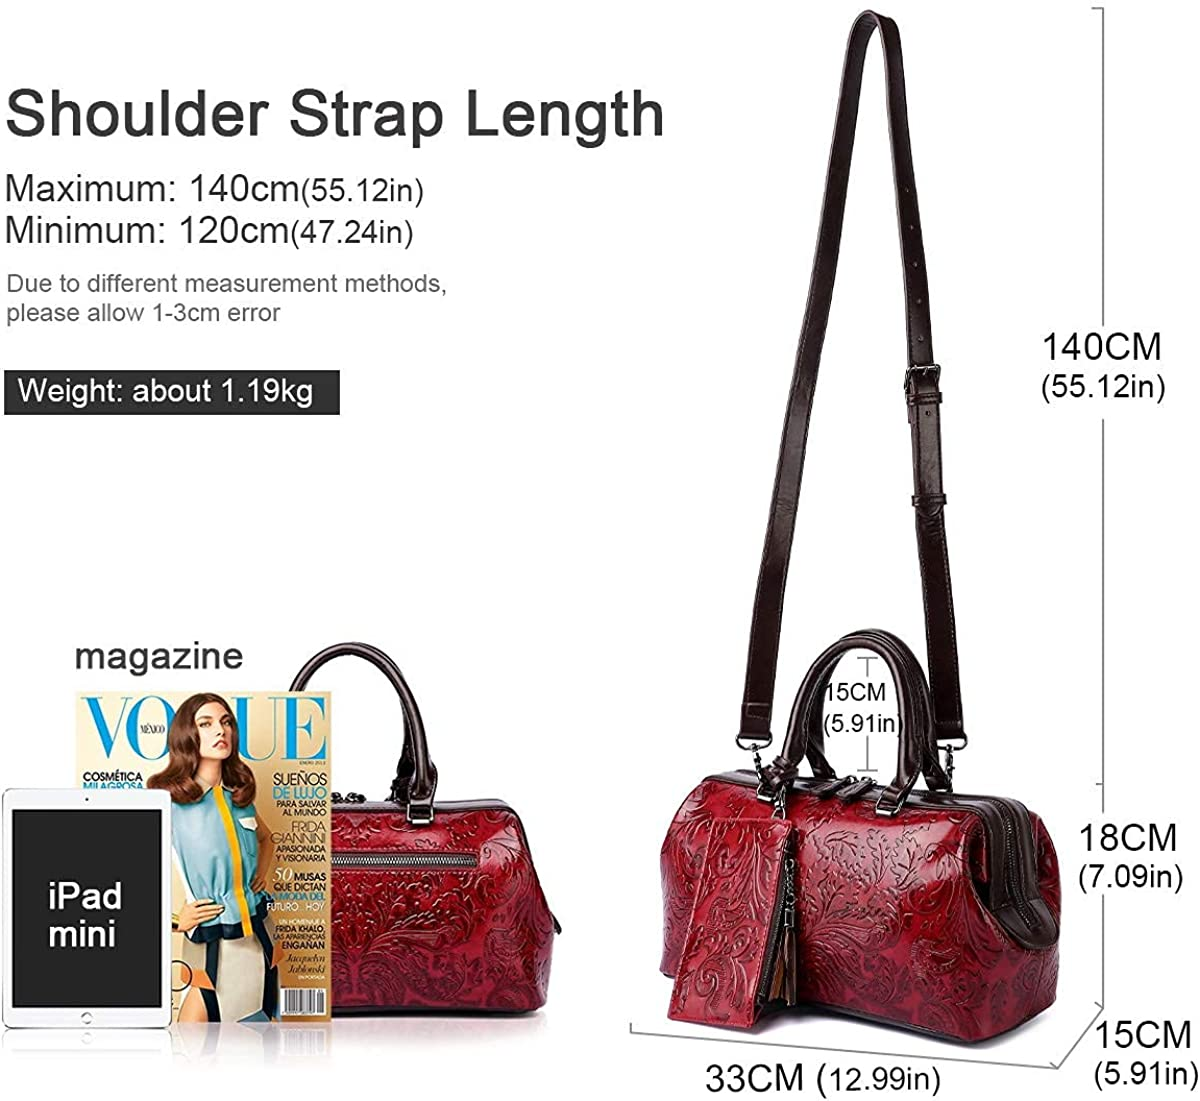 Satchel Handbags and Purses for Women Embossed Top Handle Shoulder Bags 8340